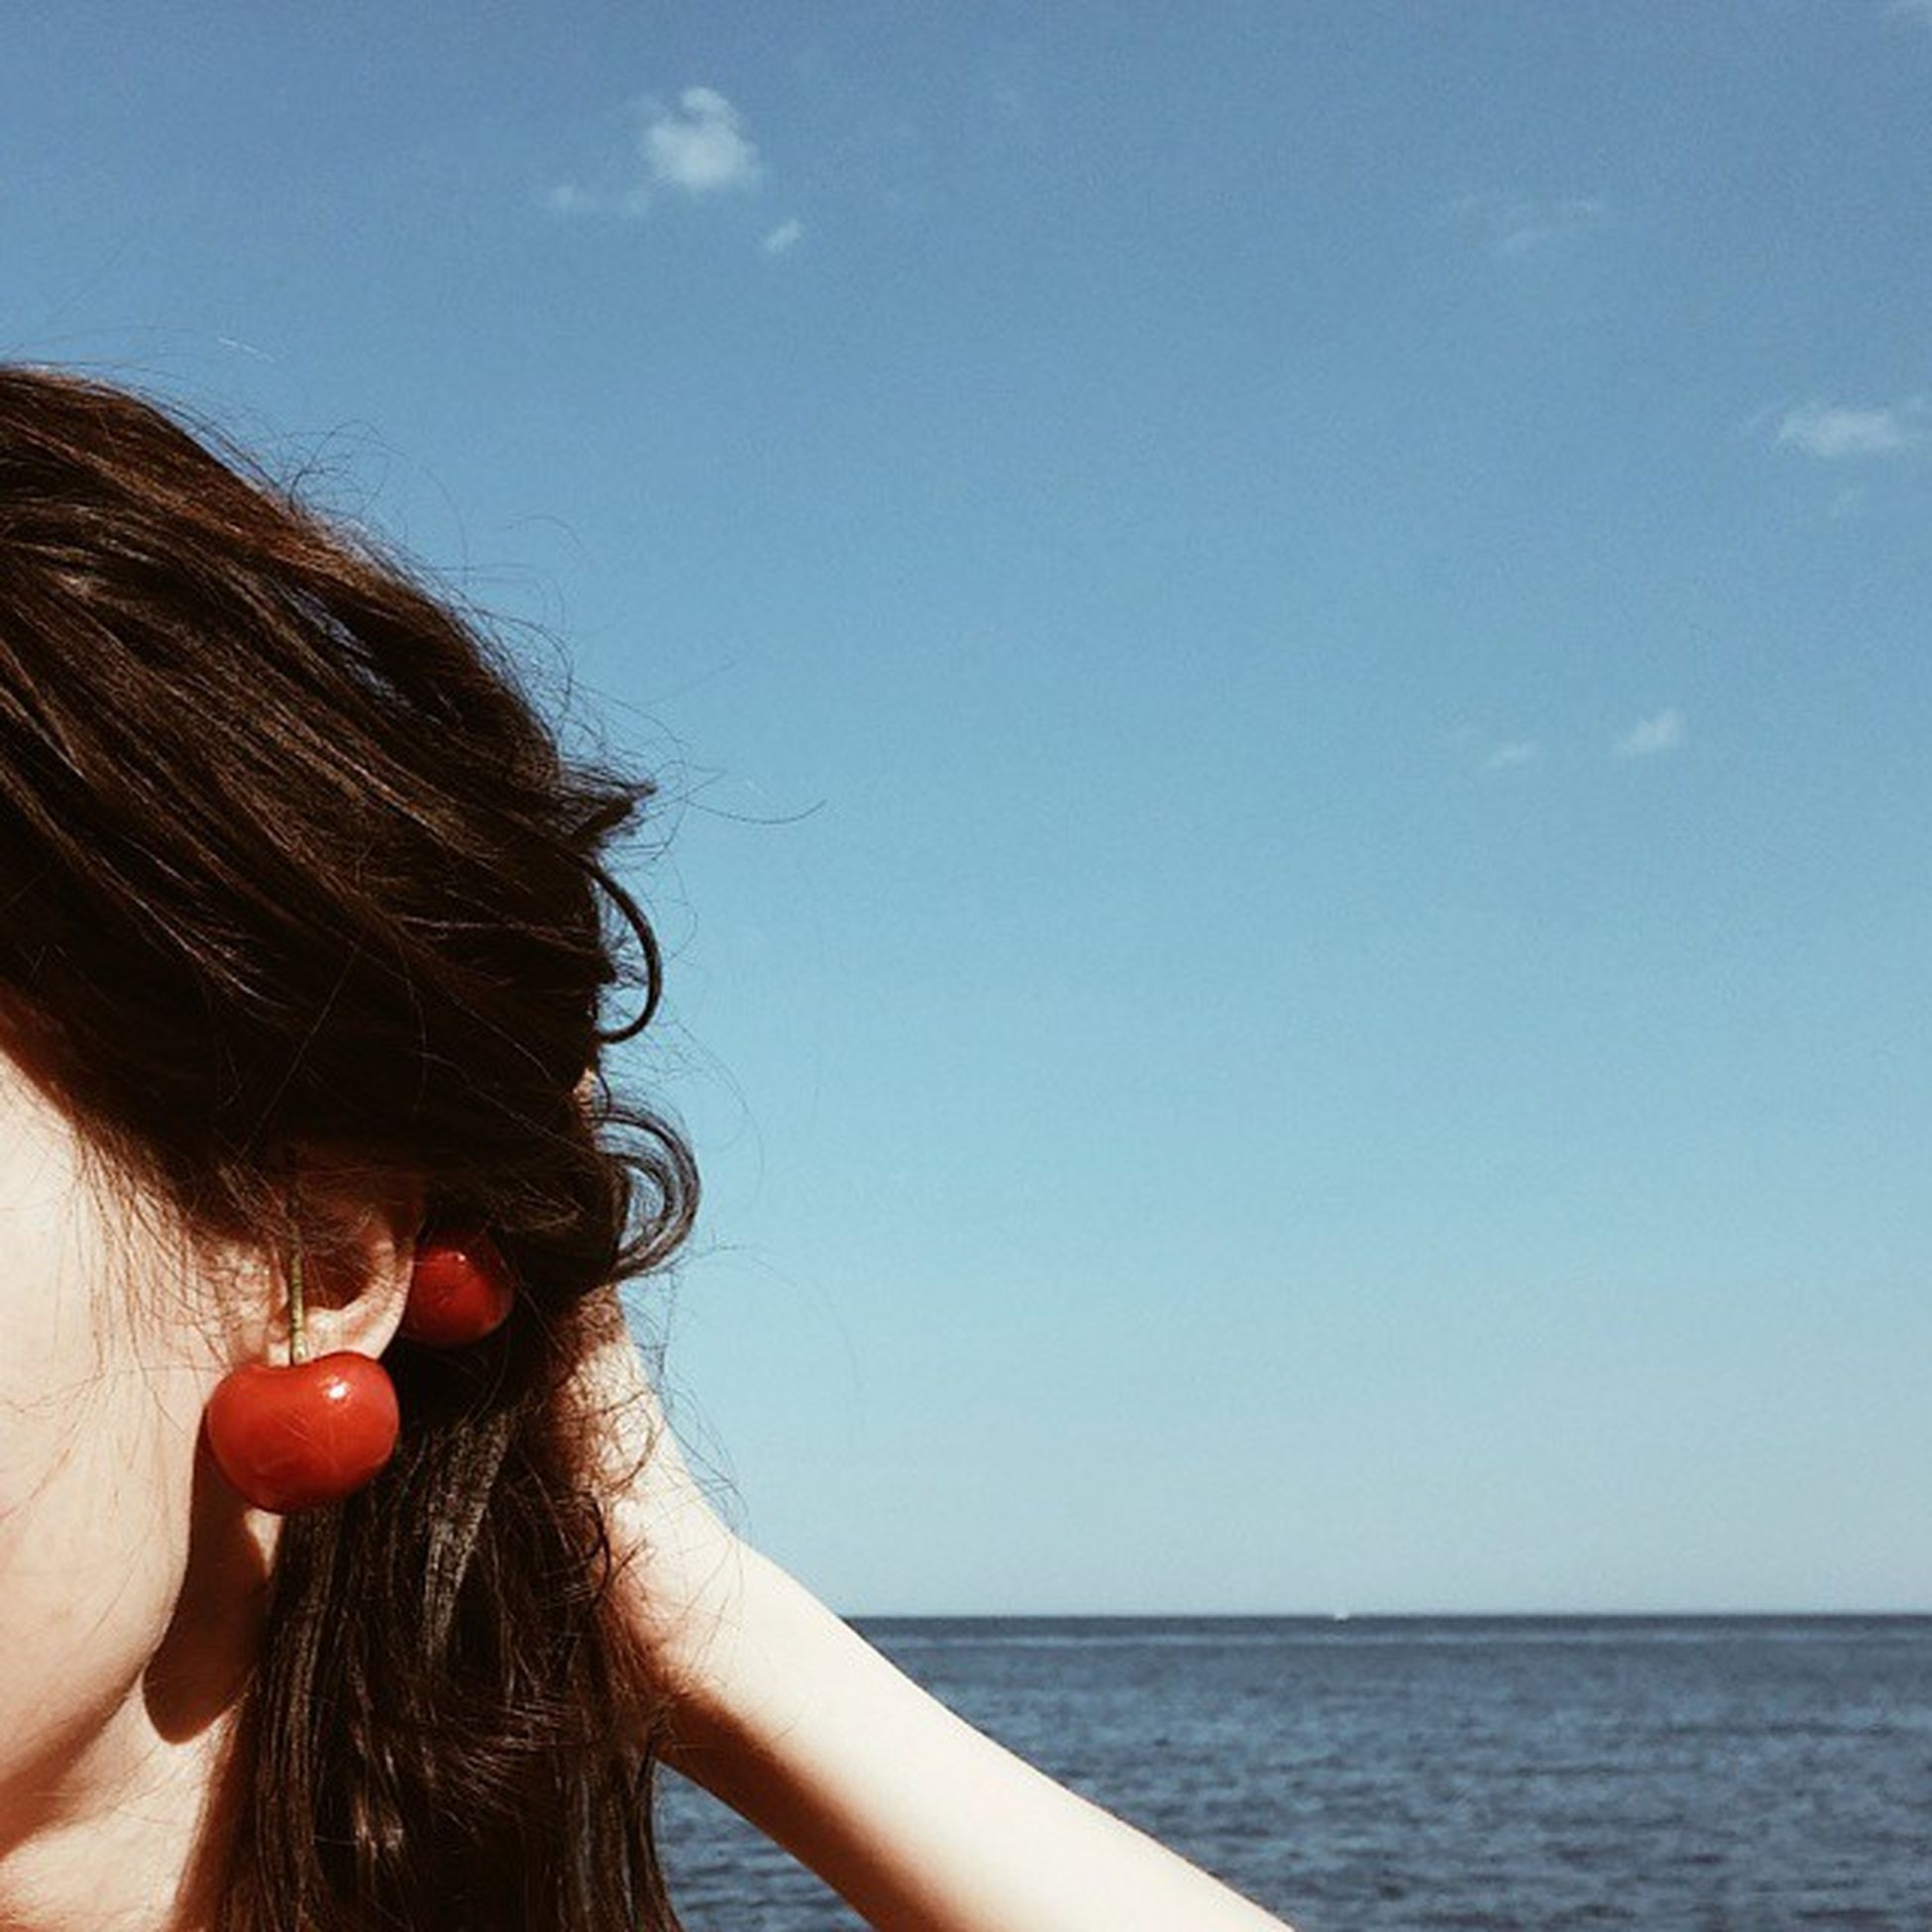 Cherry is the new cuff🍒 Или привет из Одессы💭 Picoftheday Od_insta Seastyle Sea Style Cherrylover Cherry Cuff Sealover  Sky Hair Hairstyle Hello Ears Odessa Odessafm Insta_Odessa Vscocam VSCO Igukraine Woman Seapattern Earings одесса моренебооблака море черешня inspiration vacation bluesky